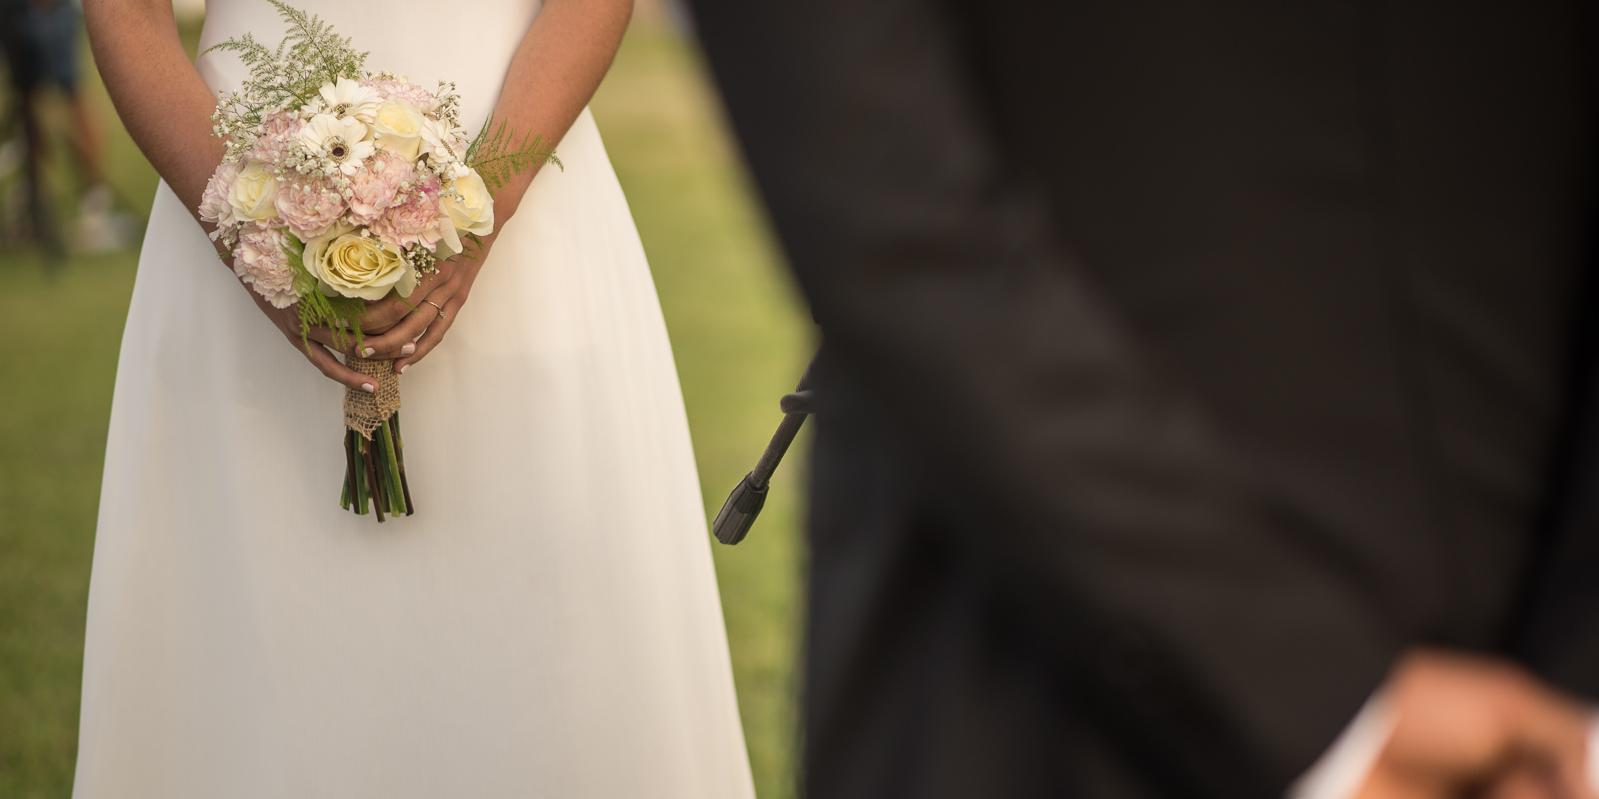 bodas-estilo-libre-jardin-cuba-8971.jpg